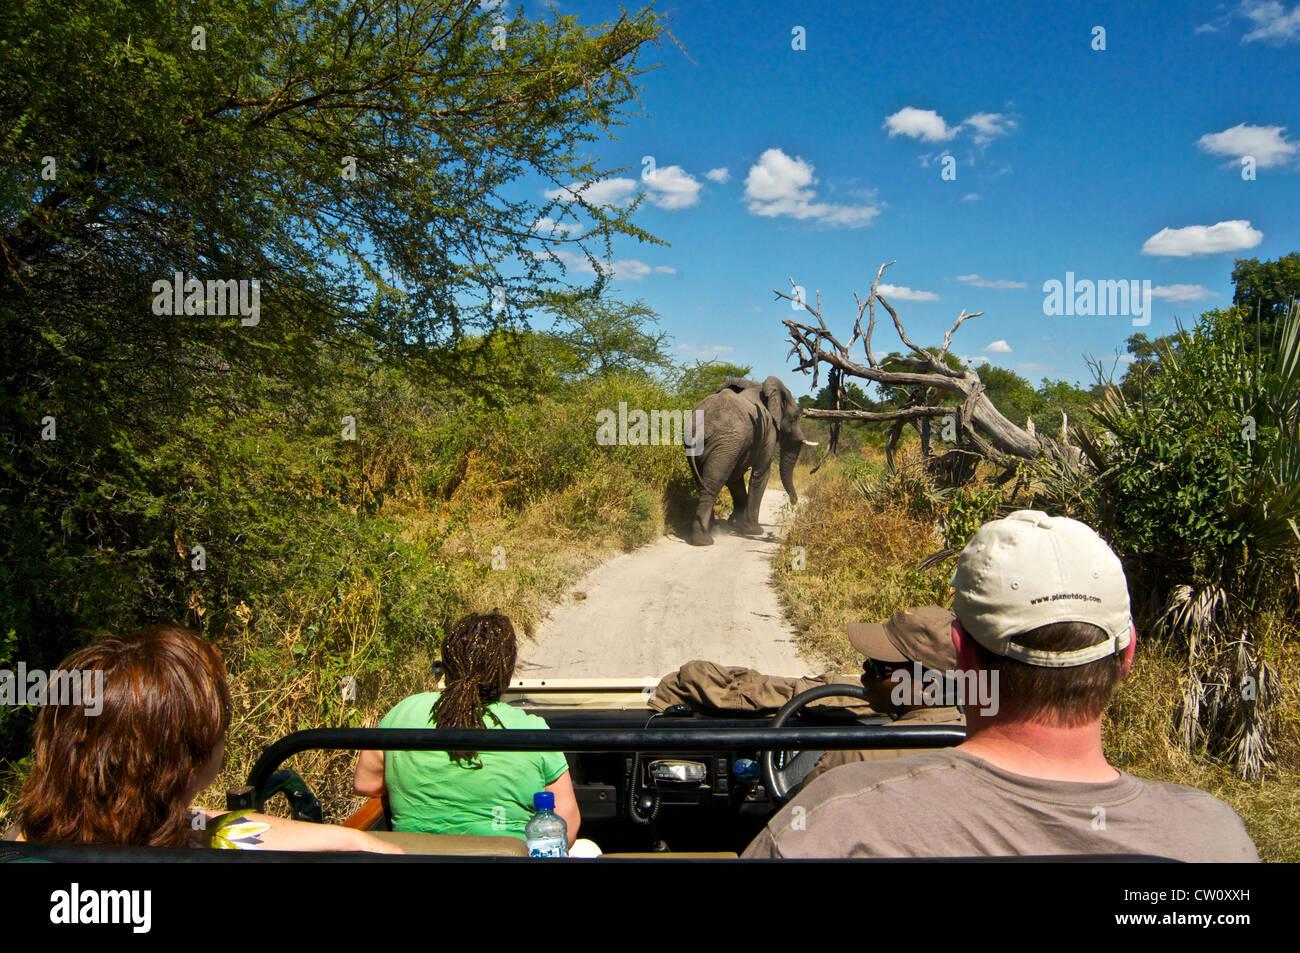 Tourists watching elephant on a safari trip in Botswana, Africa. - Stock Image